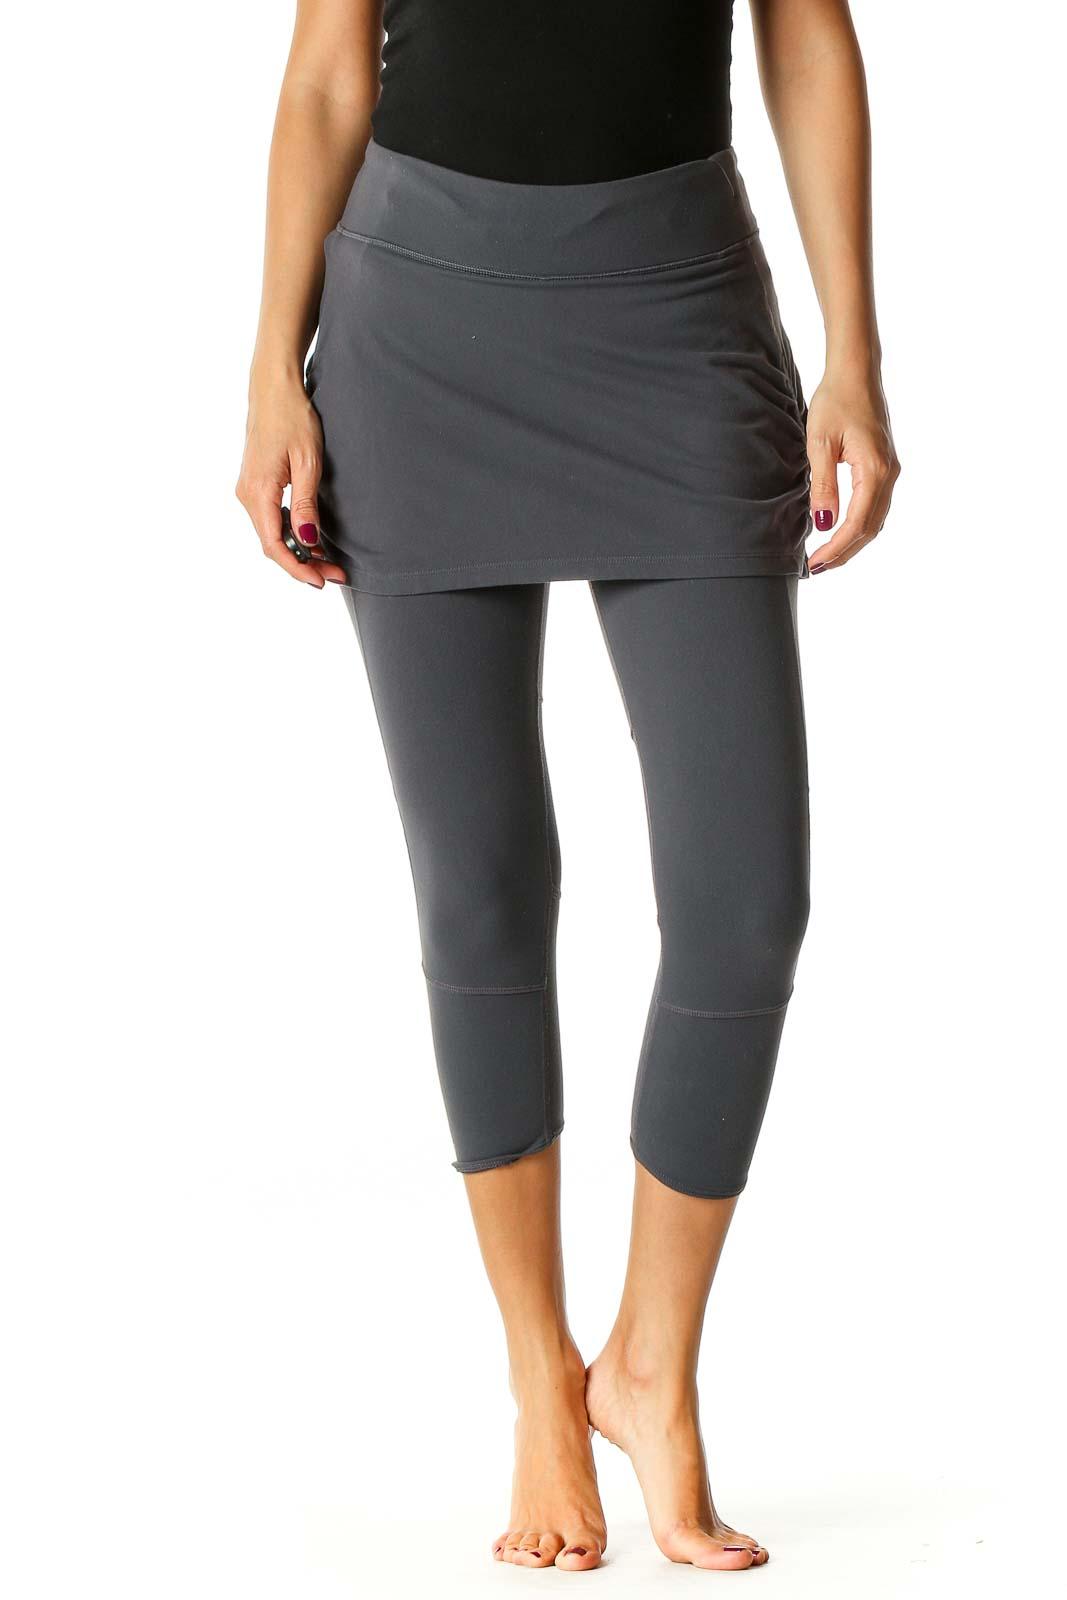 Gray Solid Activewear Capri Leggings Front